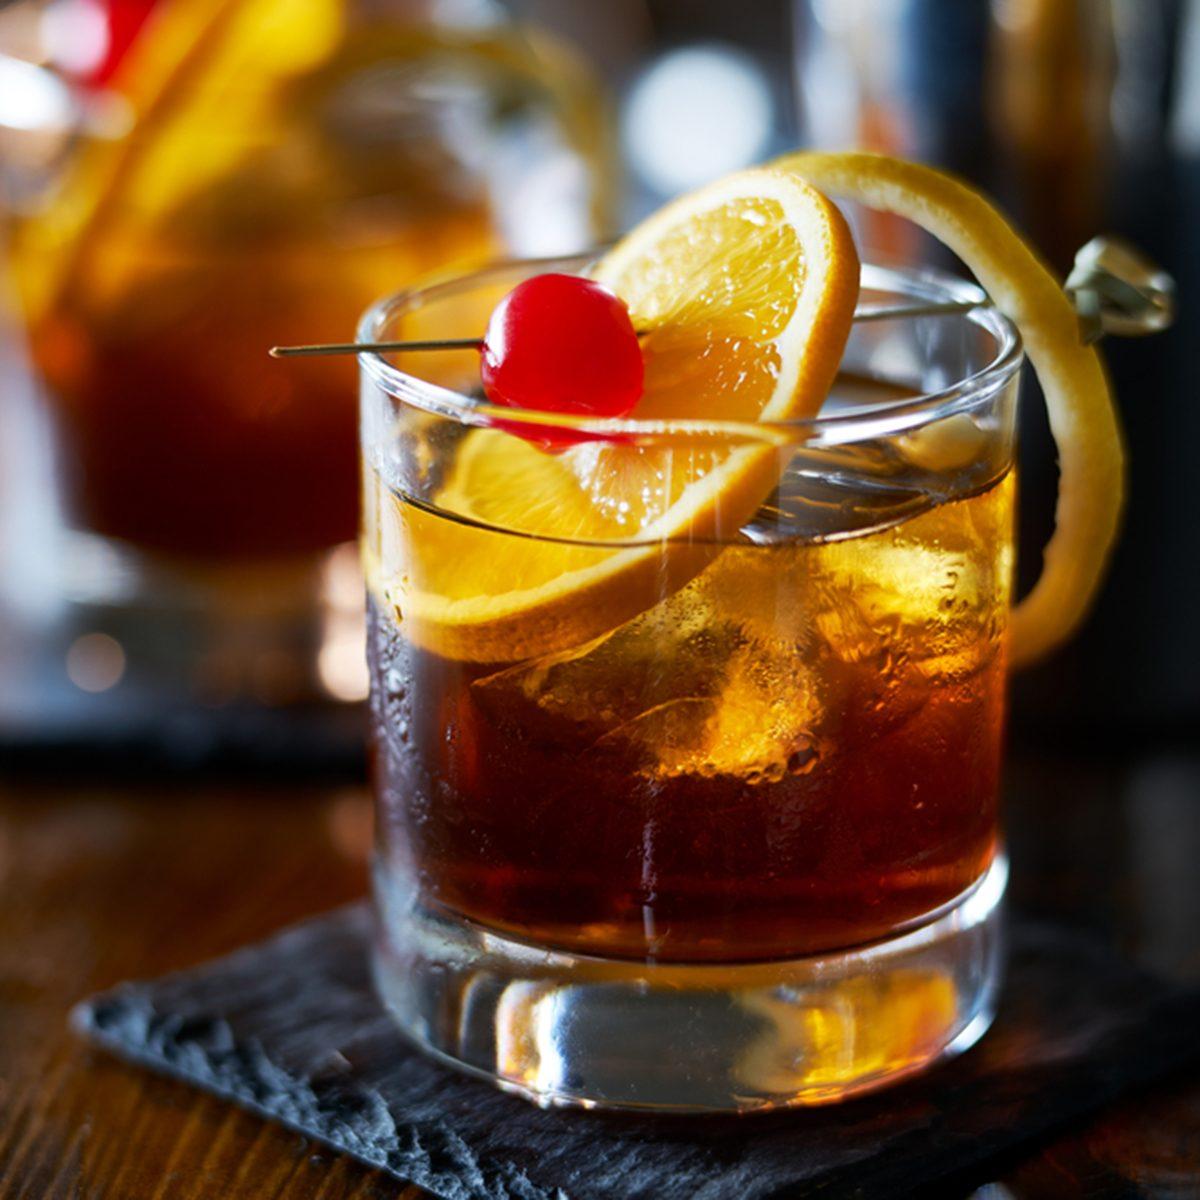 tasty alcoholic old fashioned cocktail with orange slice, cherry, and lemon peel garnish; Shutterstock ID 583137544; Job (TFH, TOH, RD, BNB, CWM, CM): TOH